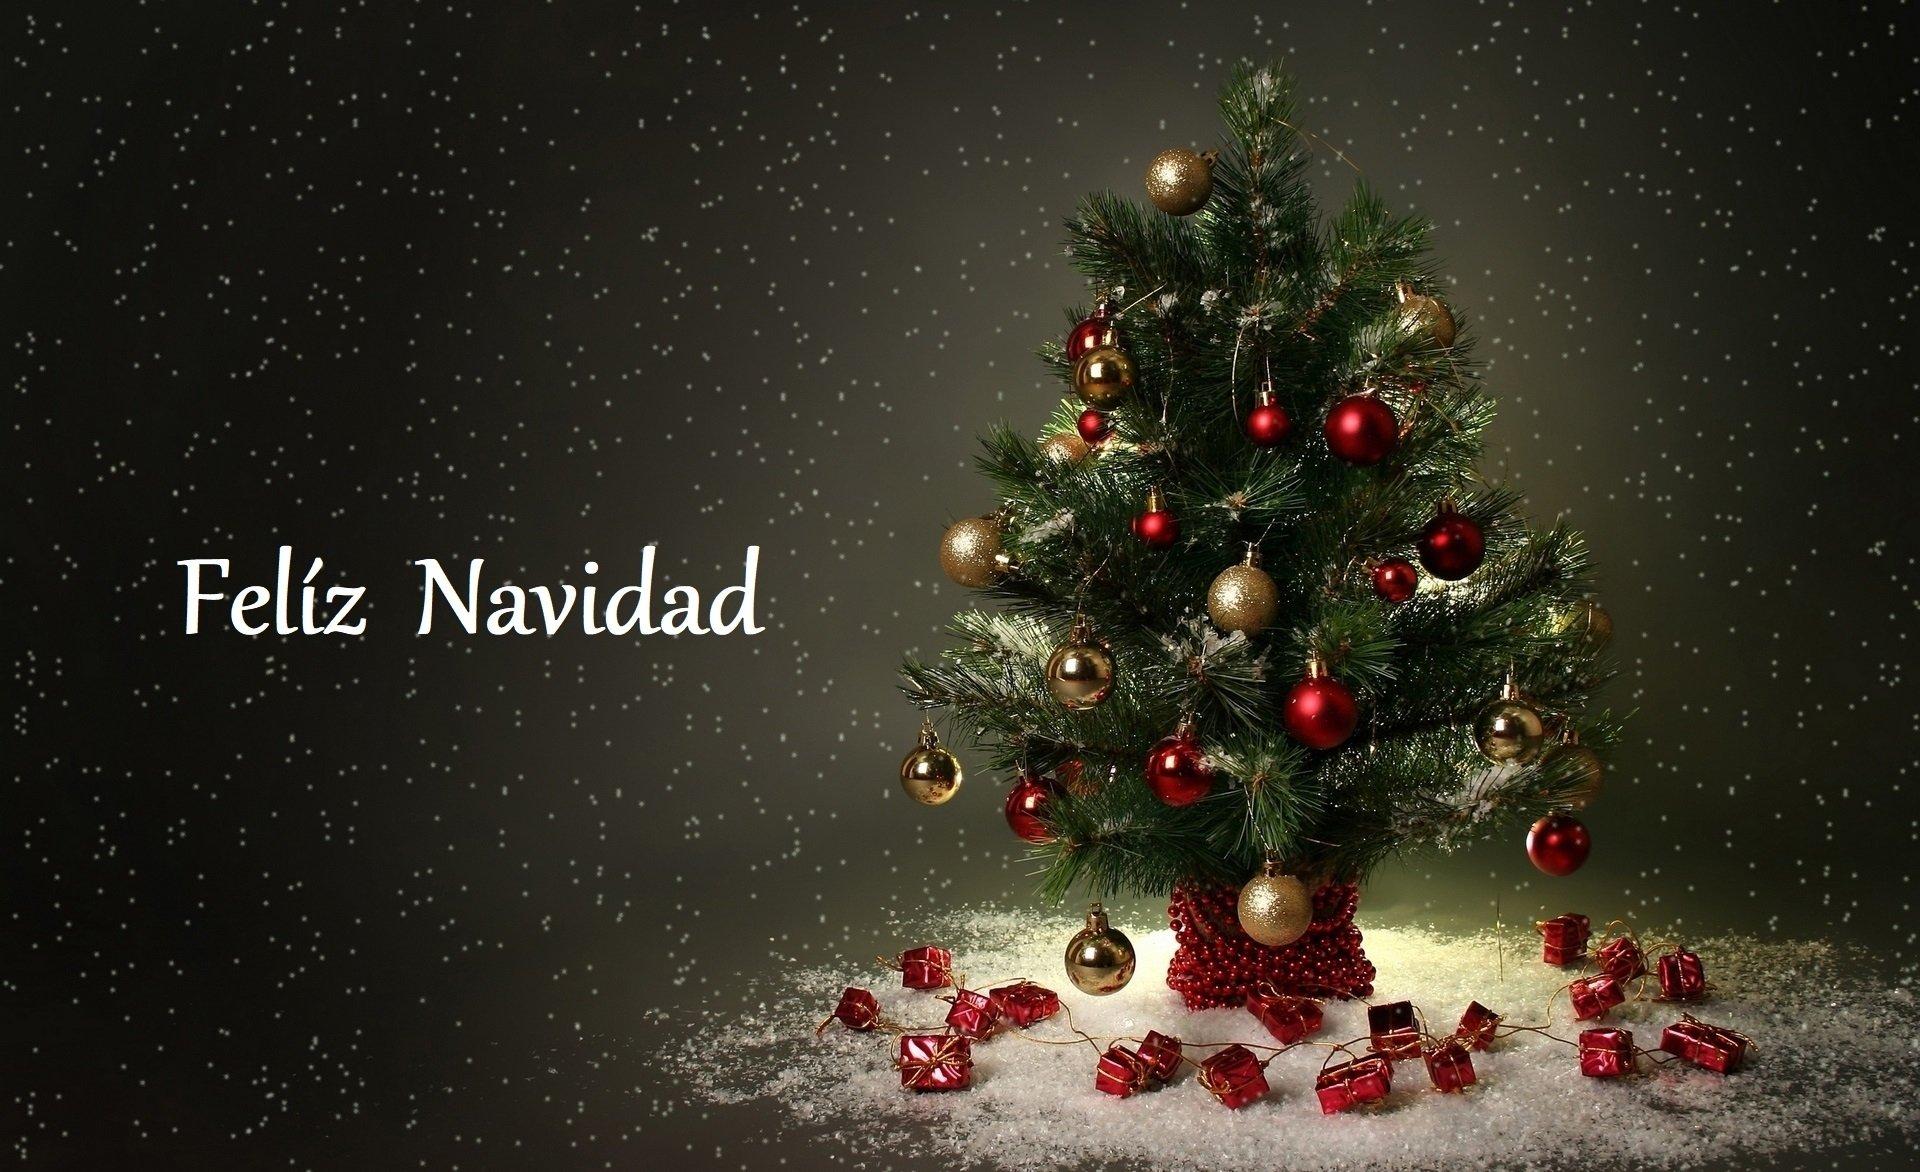 节日 - 圣诞节  Decoration Snow Christmas Tree Merry Christmas 壁纸